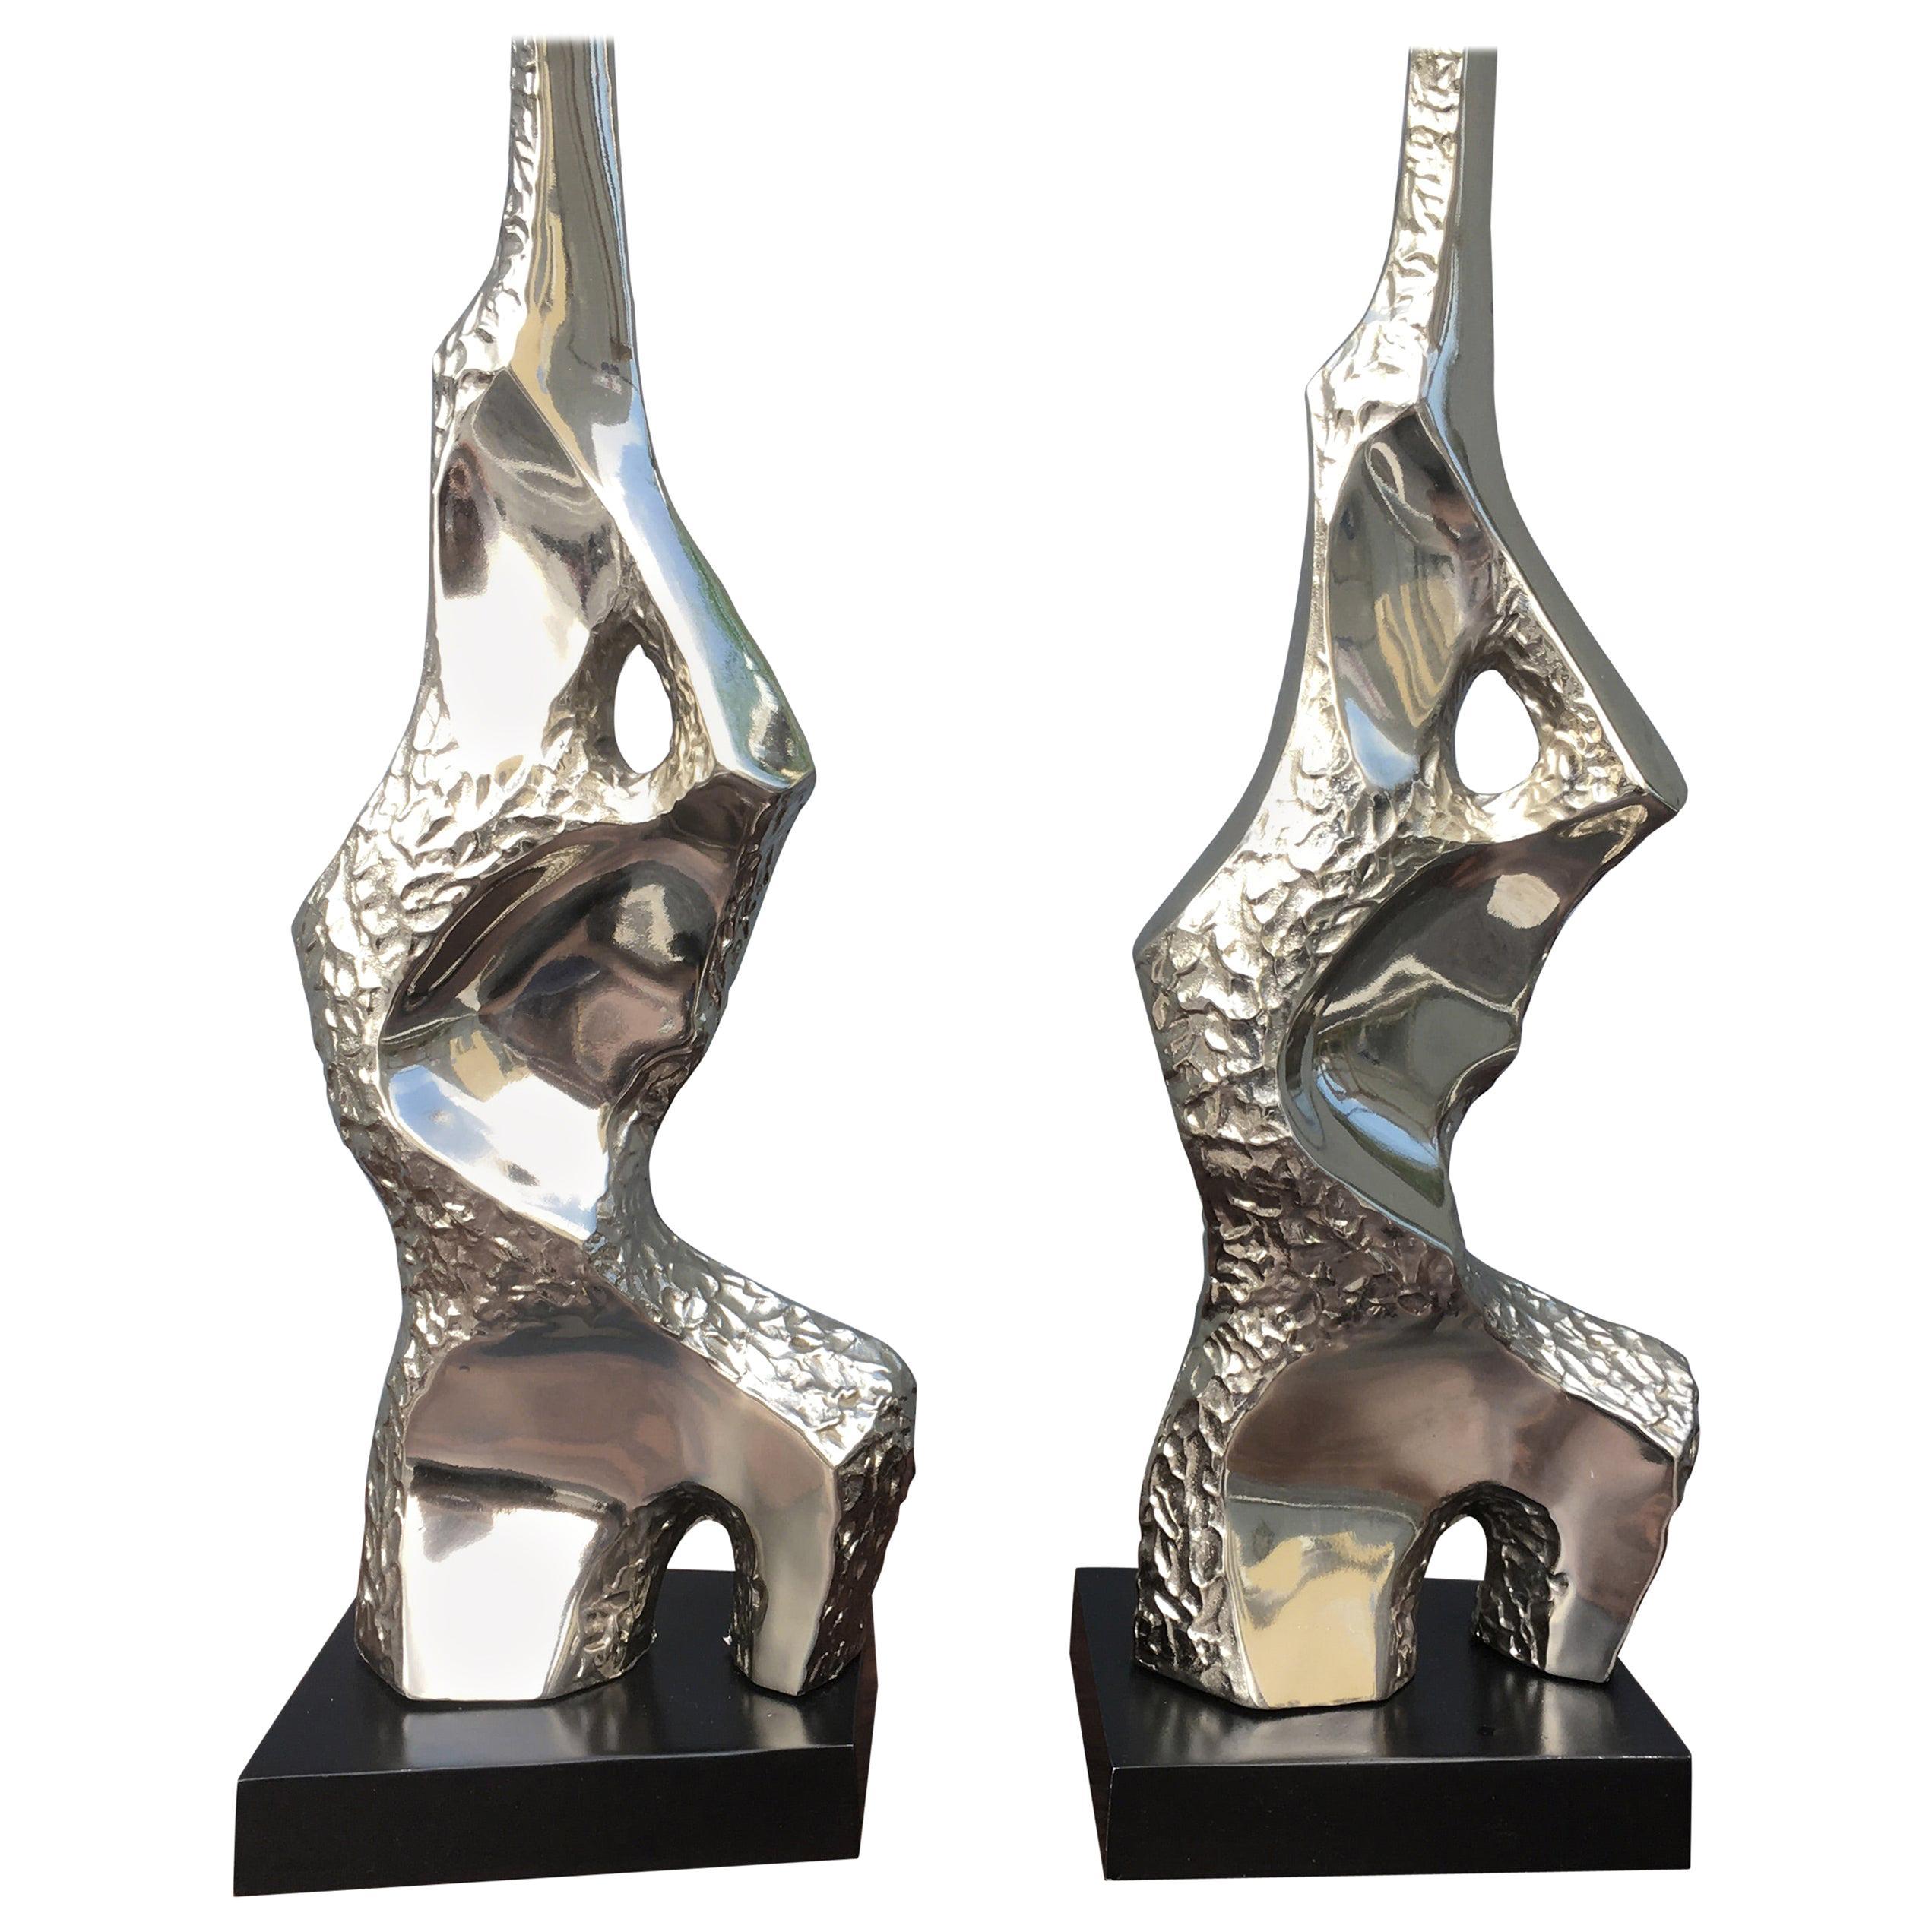 Laurel Sculptural Brutalist Table Lamps, Mid-Century Modern